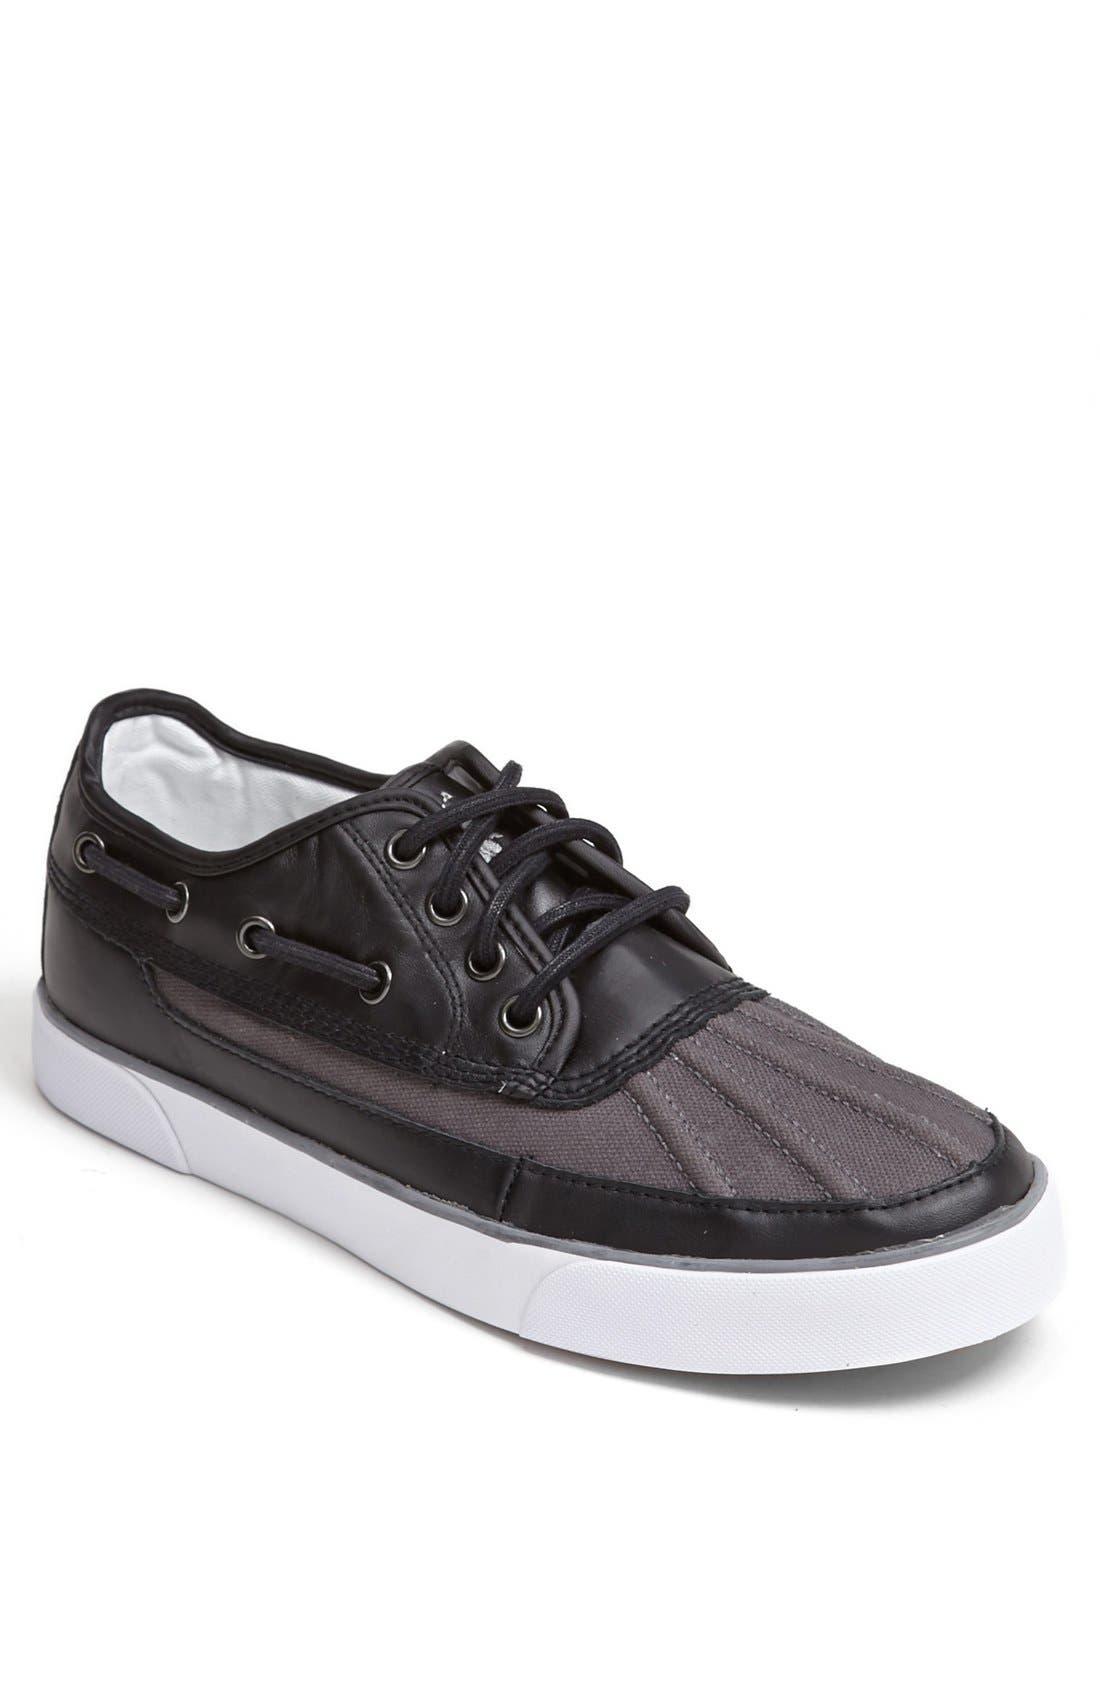 Alternate Image 1 Selected - Polo Ralph Lauren 'Parkstone' Sneaker